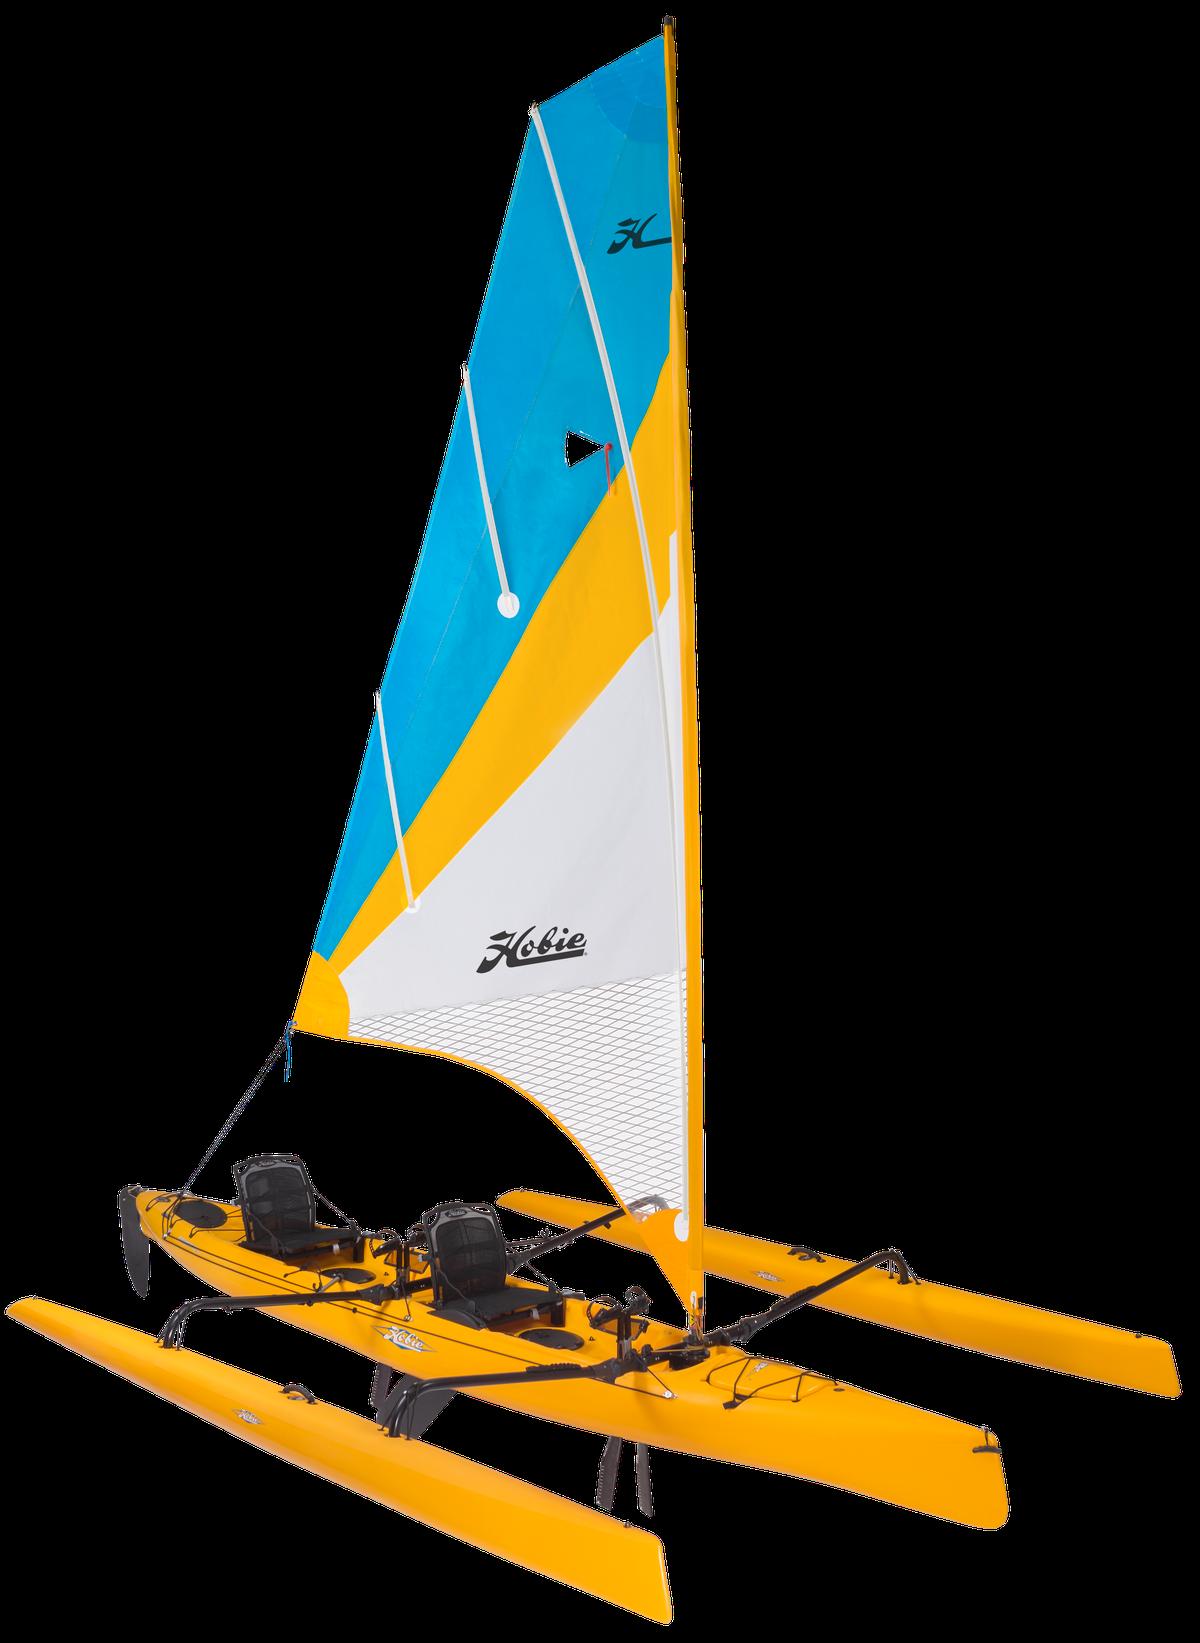 Hobie Mirage Island Kayaks For Sale Orange County CA